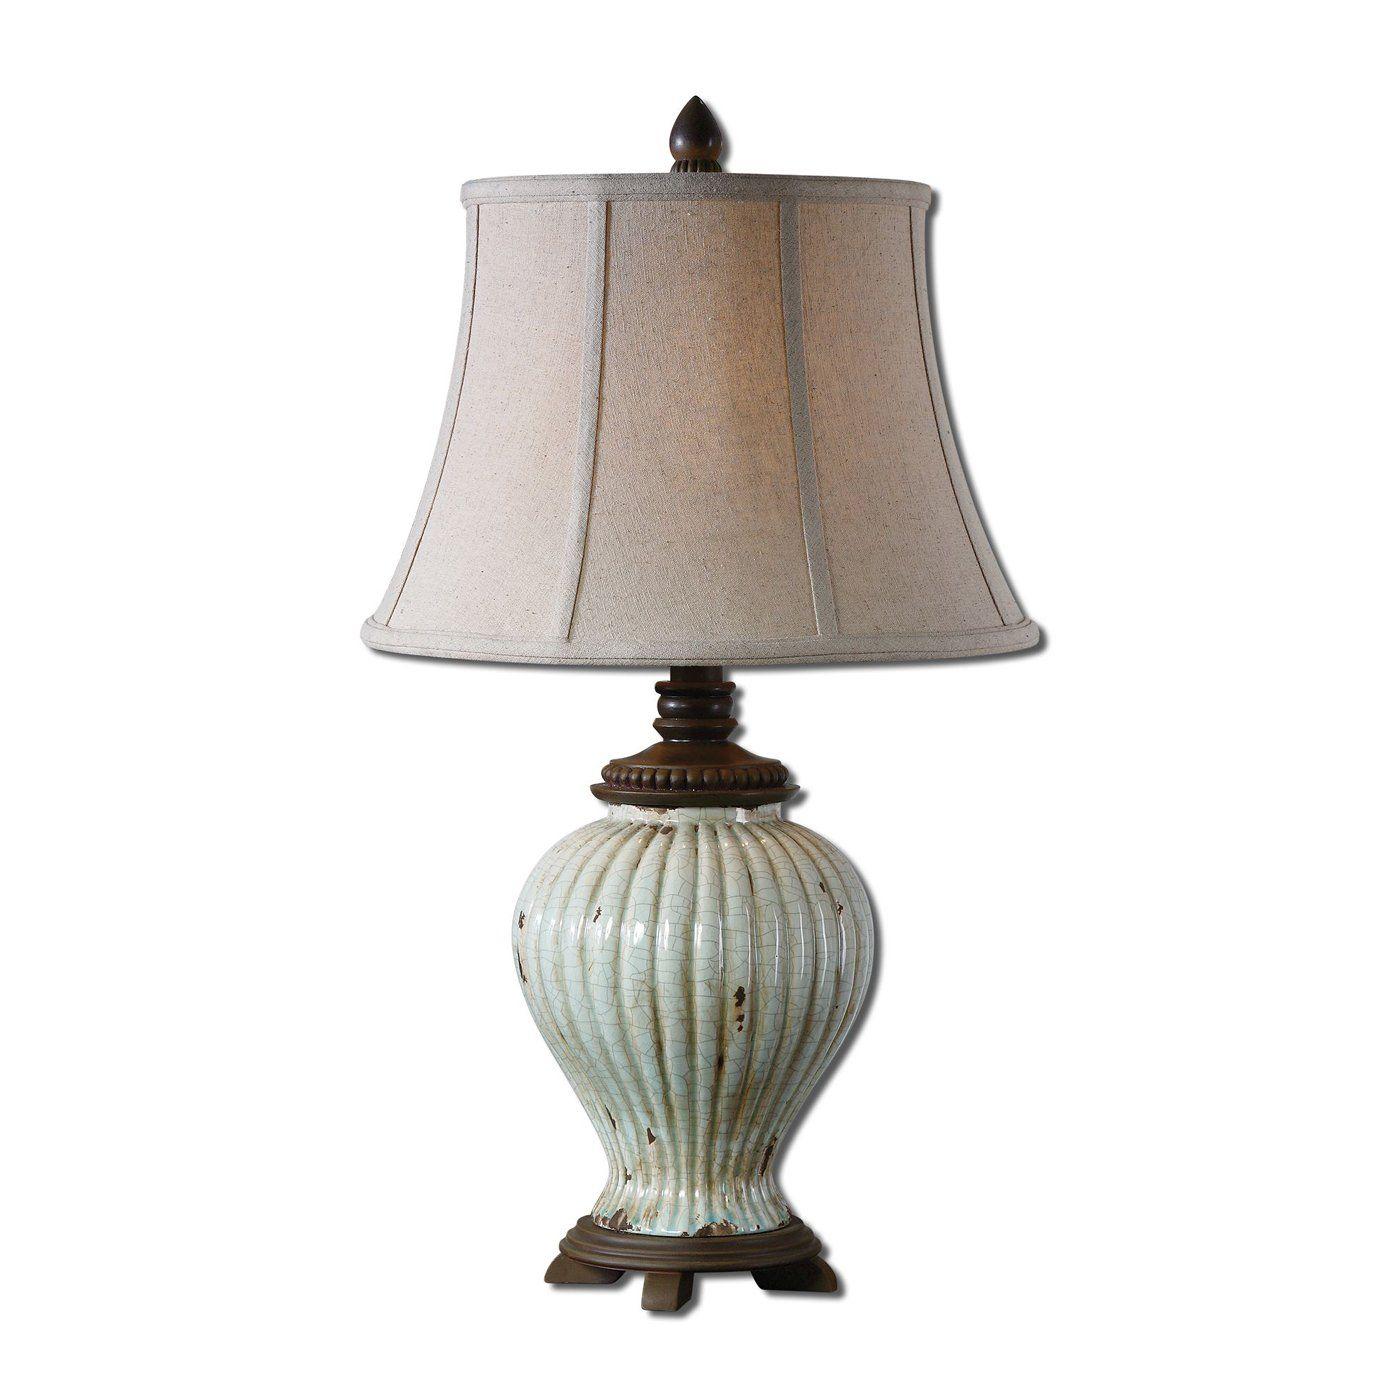 Uttermost 27477 Dernice Aged Ceramic Table Lamp  Lighting Universe